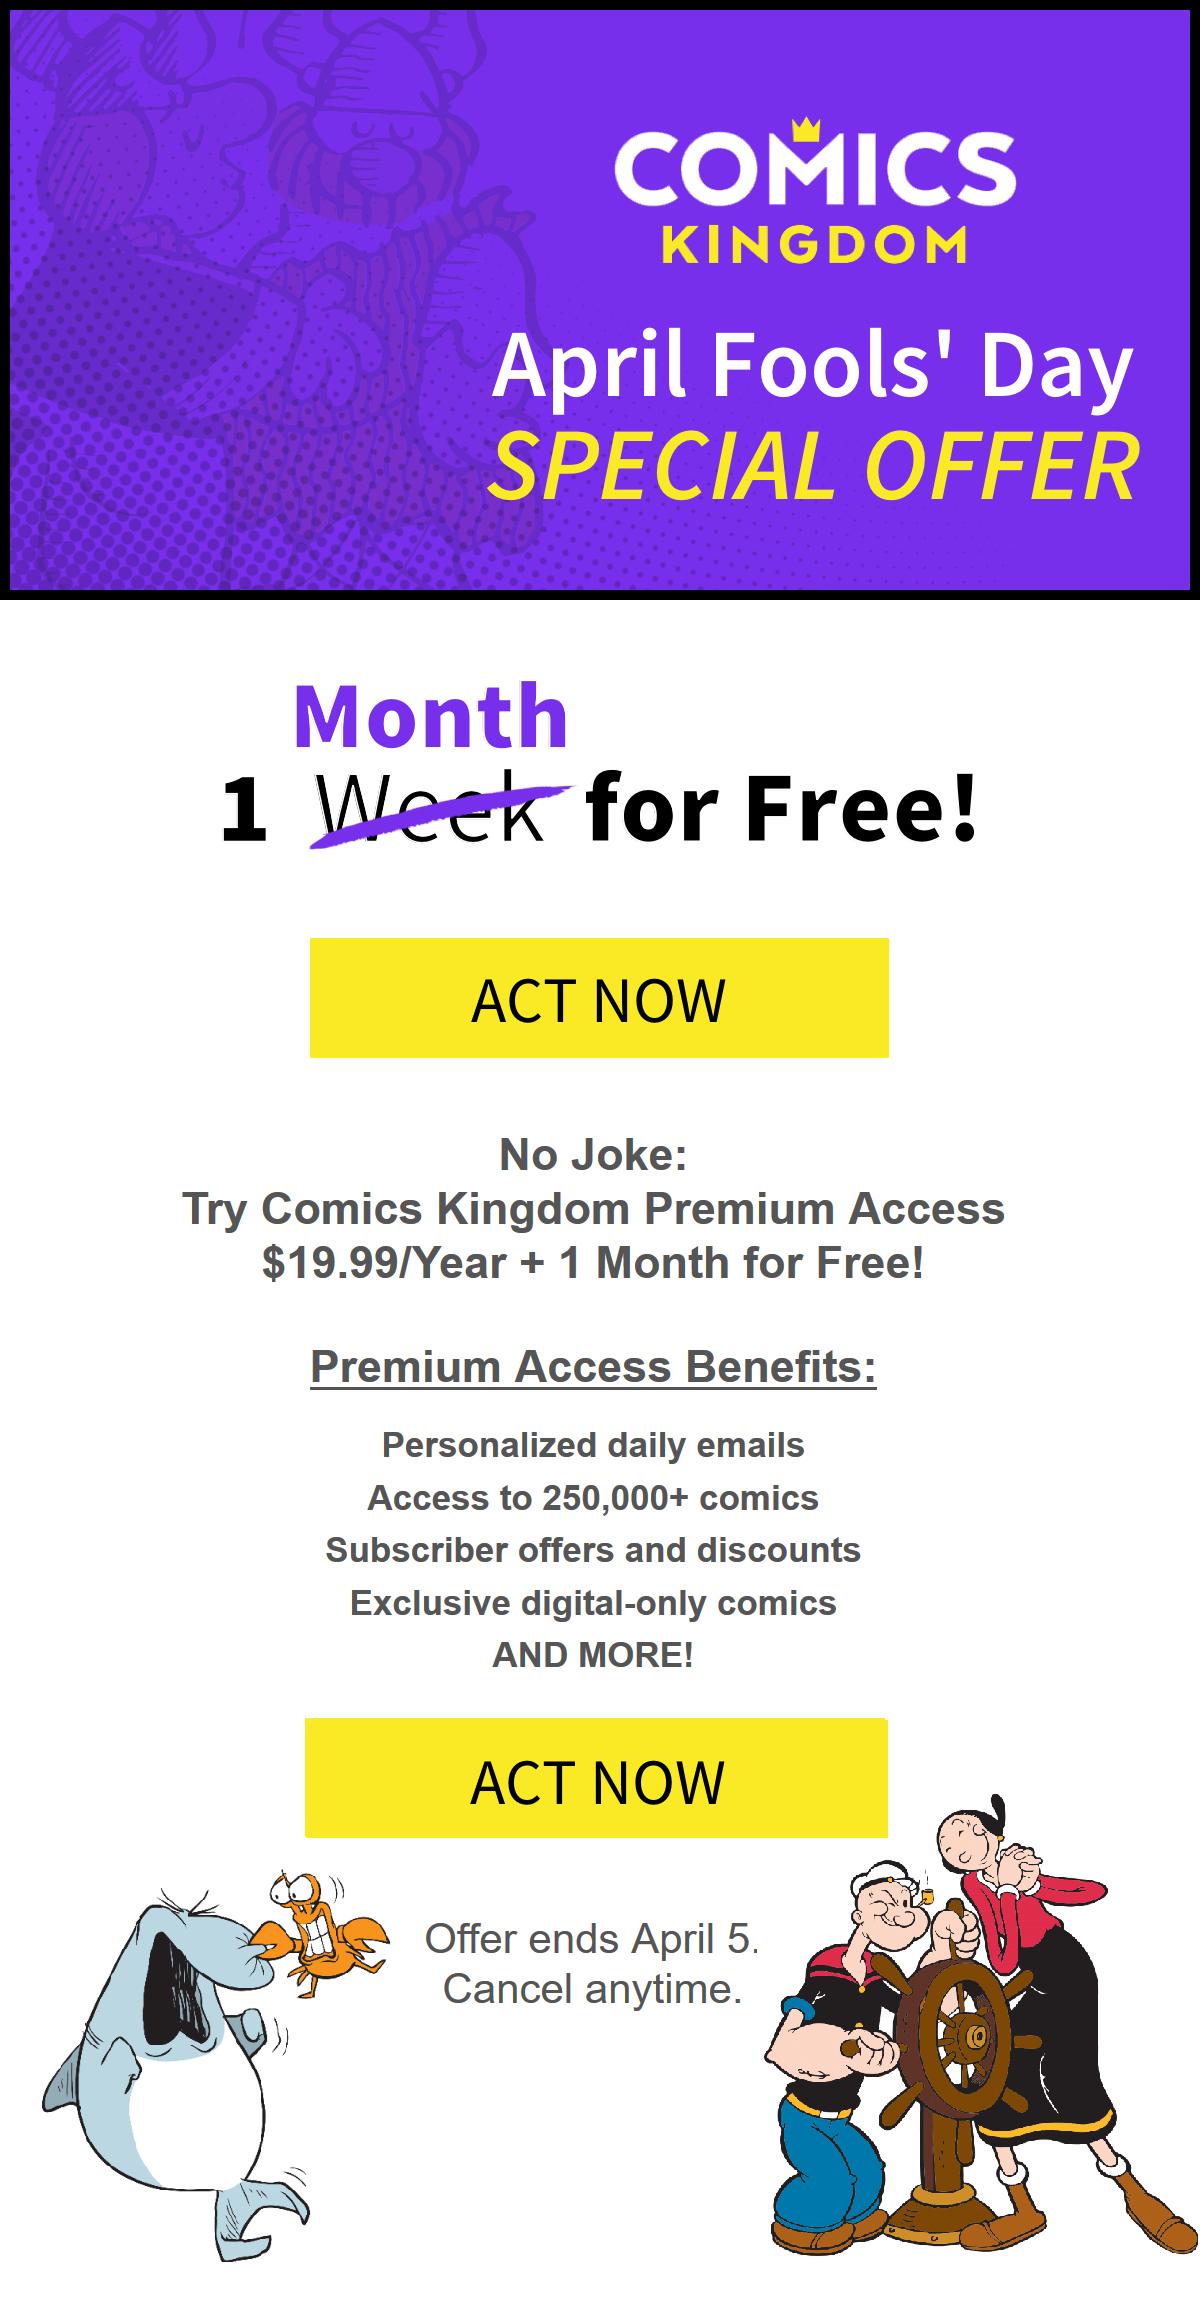 Get 1 month free of Comics Kingdom Premium Access! Offer ends April 5.